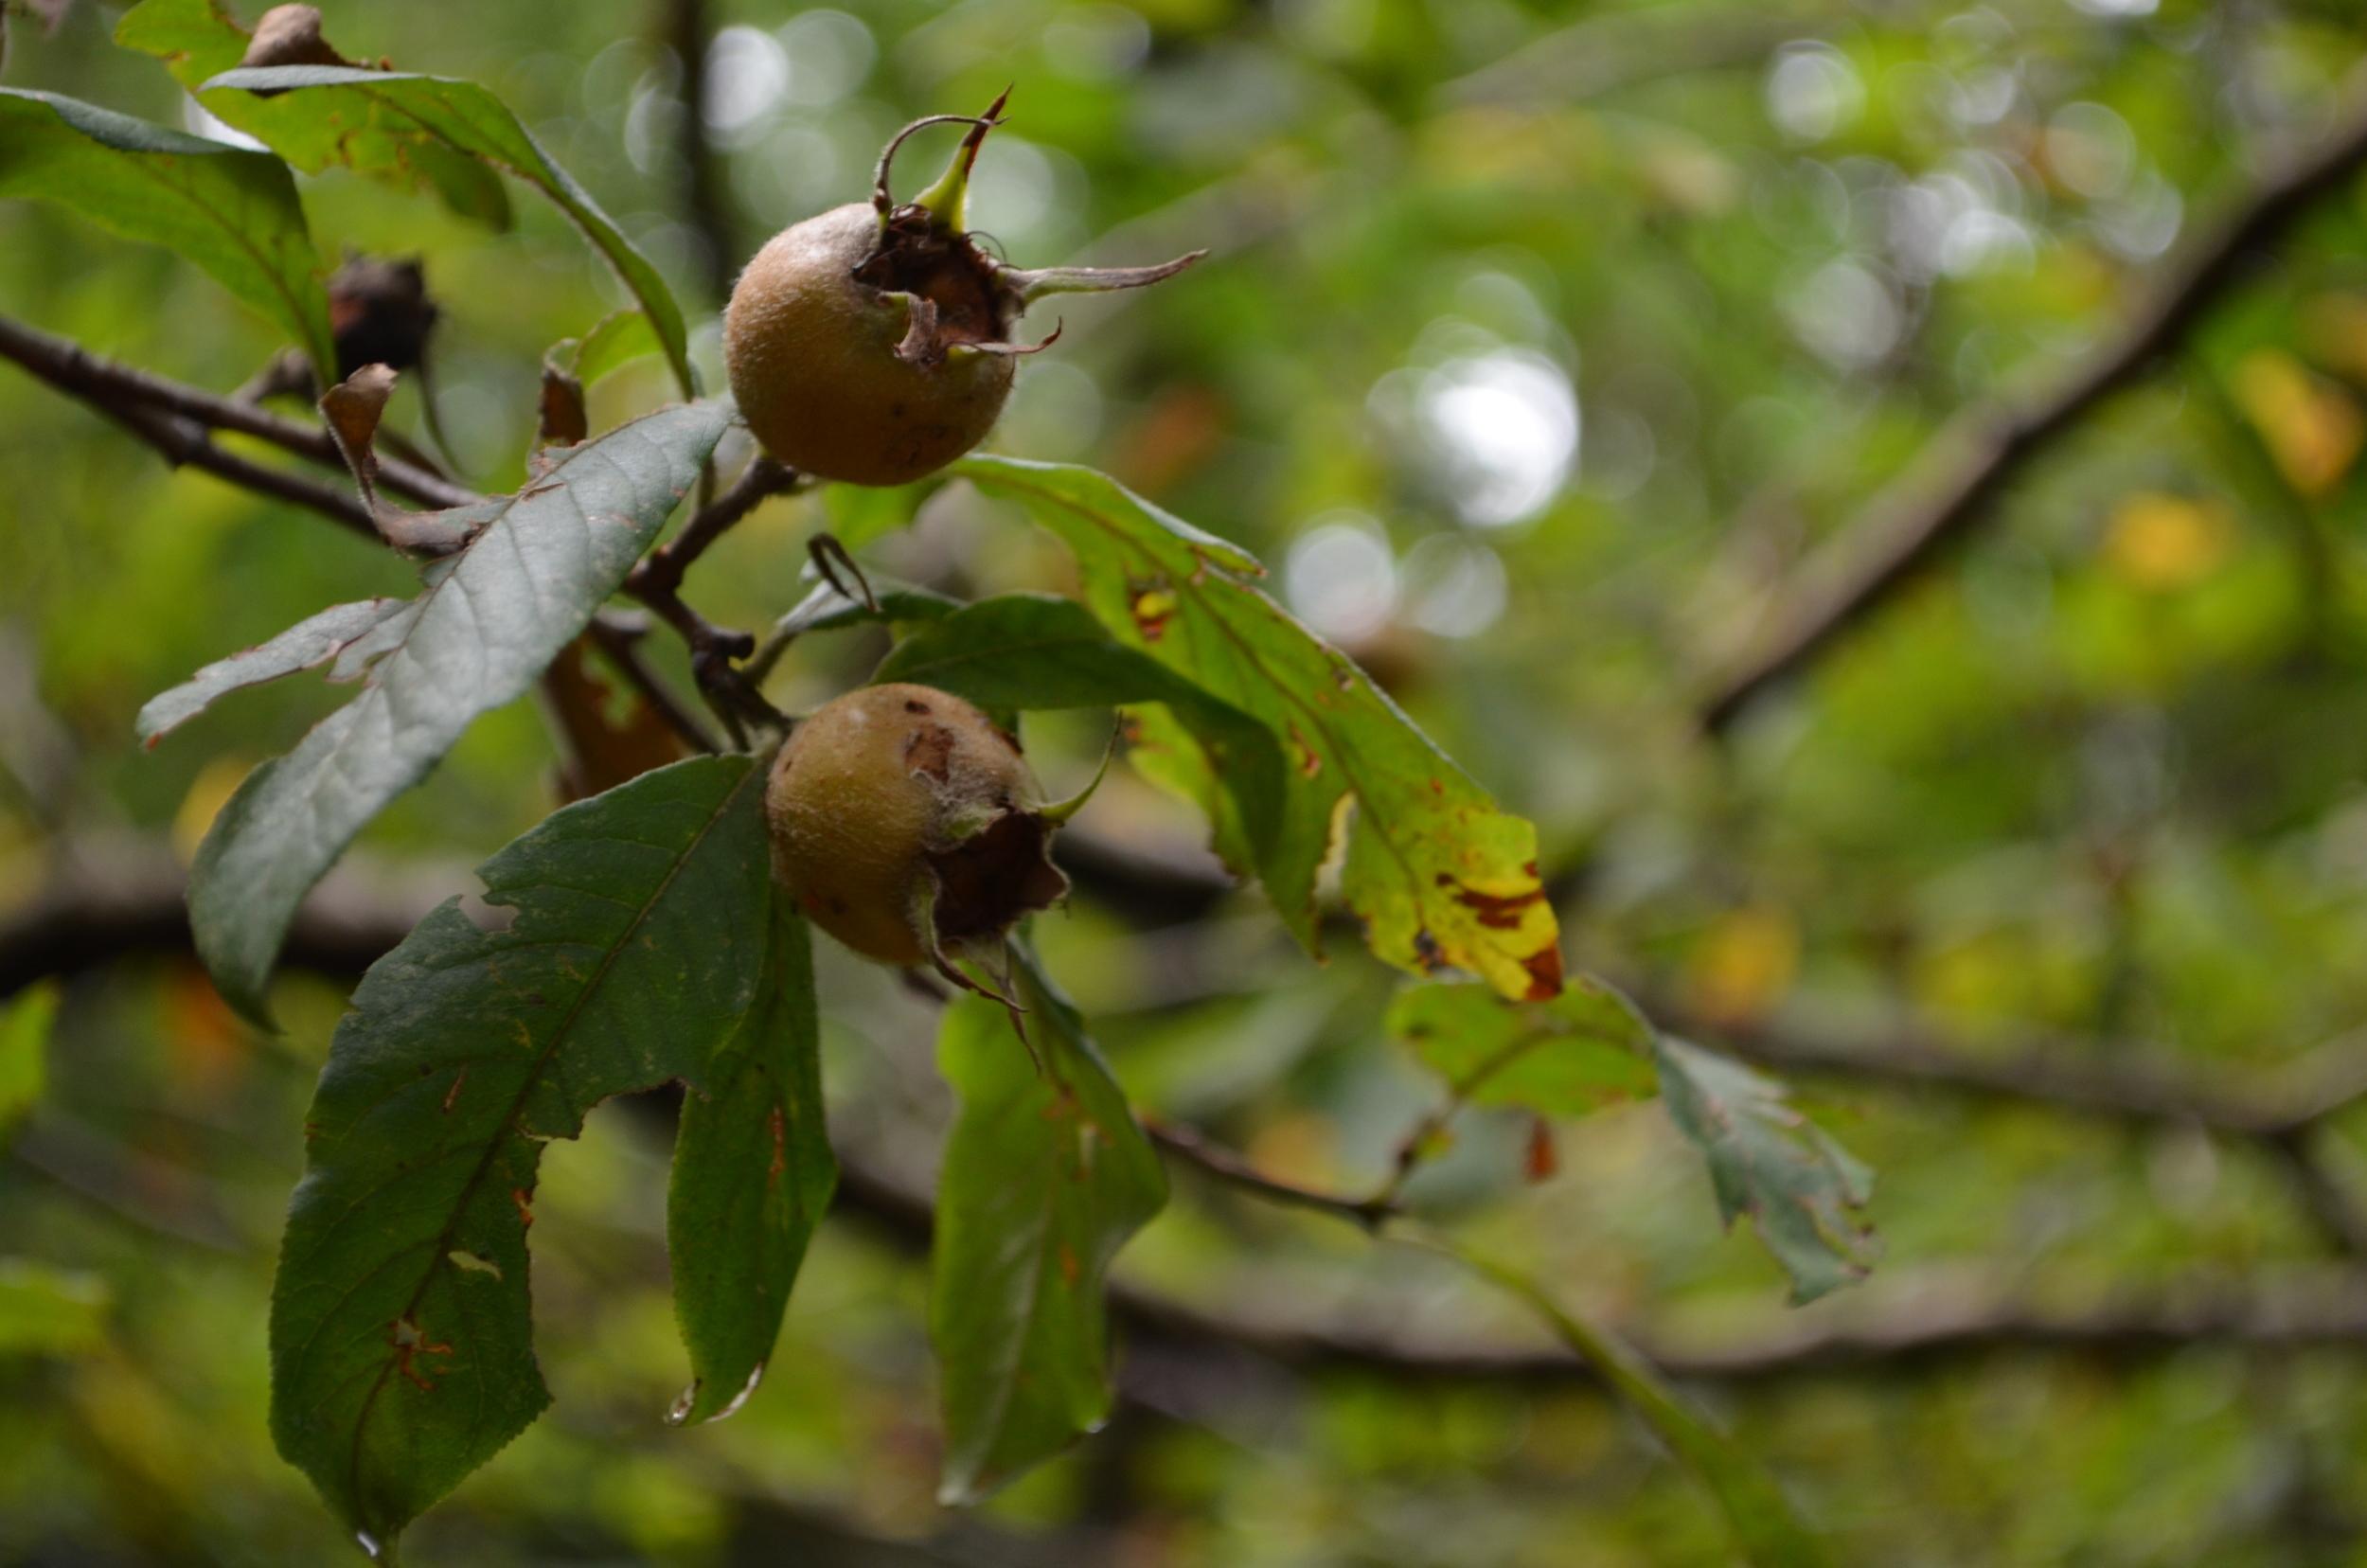 Nespolo volgare,  Mespilus germanica  (Rosaceae)